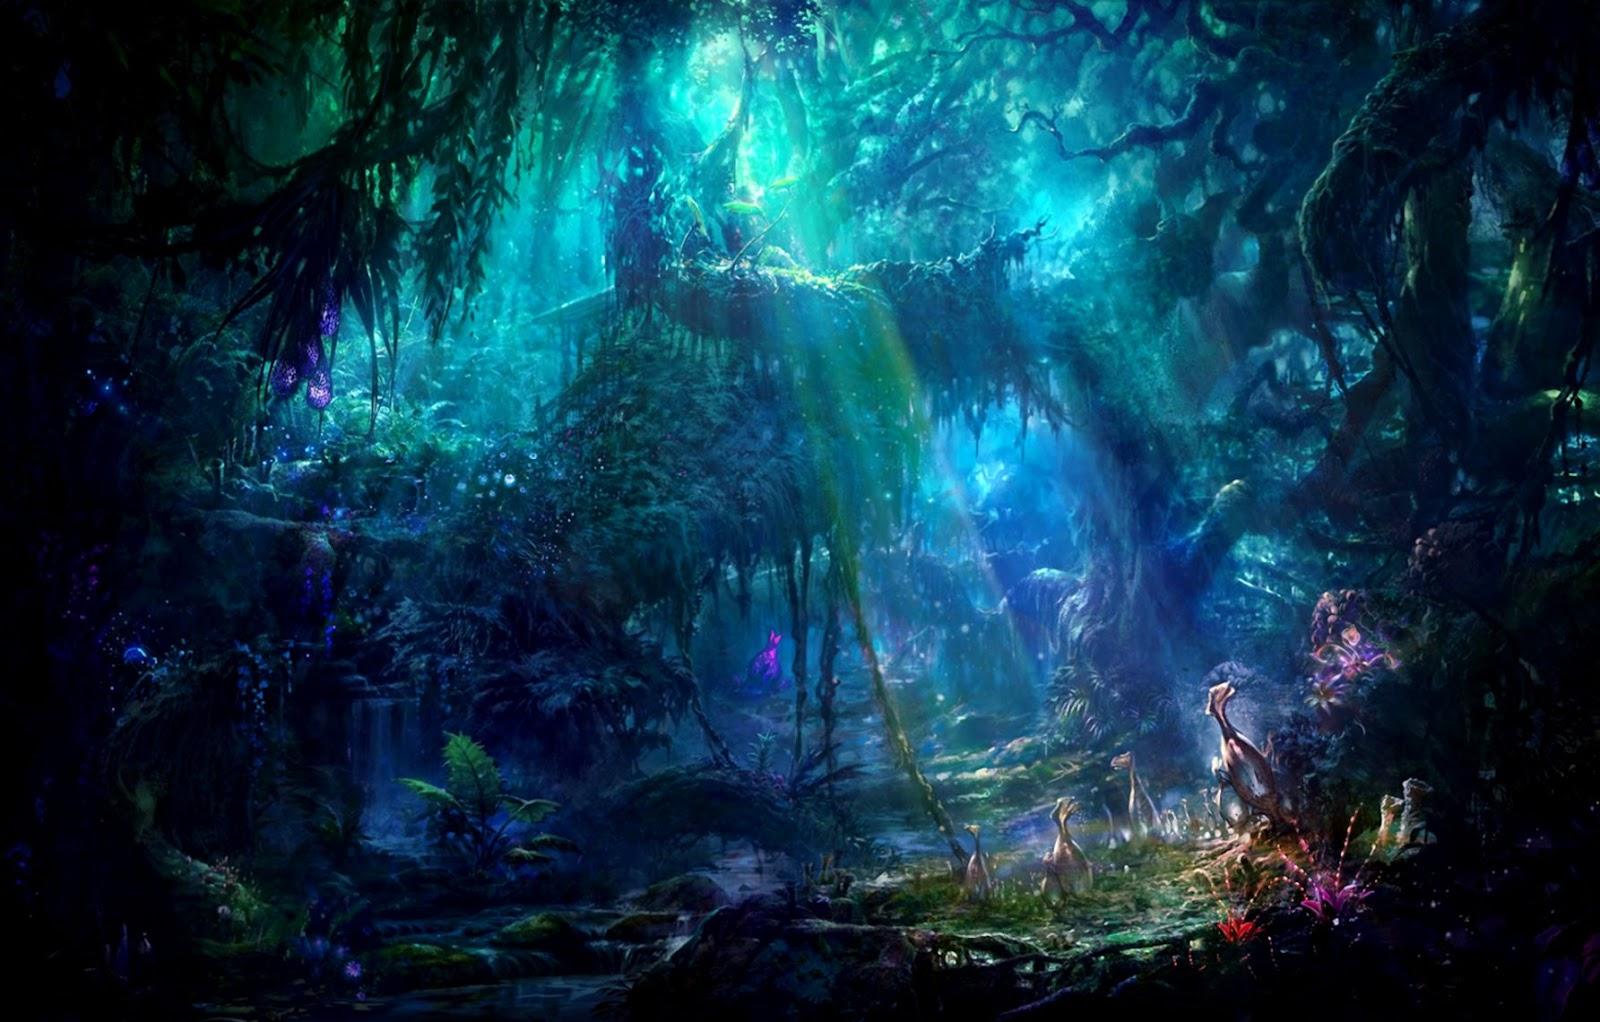 View Original Size Final Fantasy Landscape Wallpaper Hd